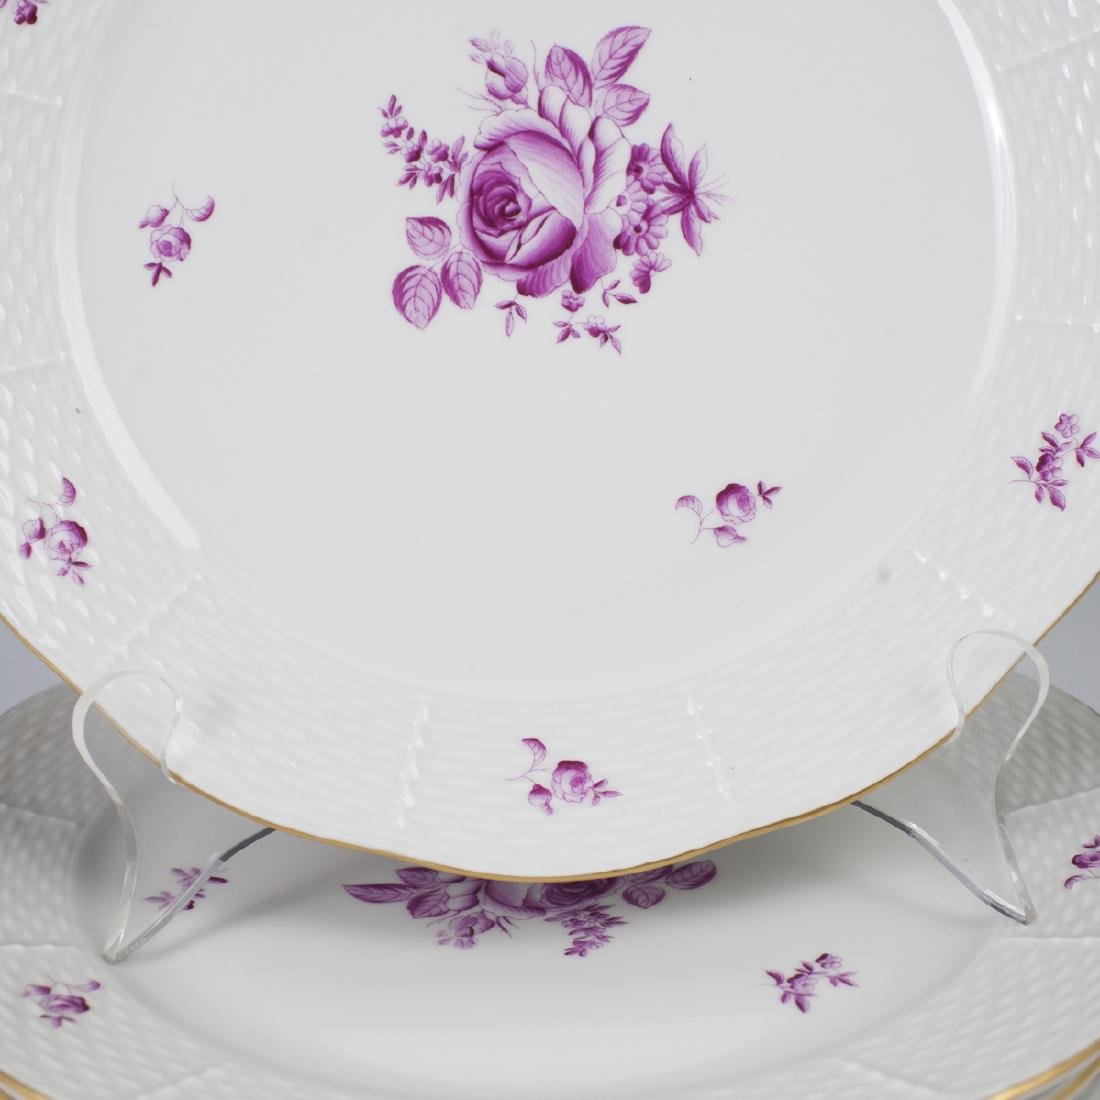 Herend Porcelain Dinner Plates - 3